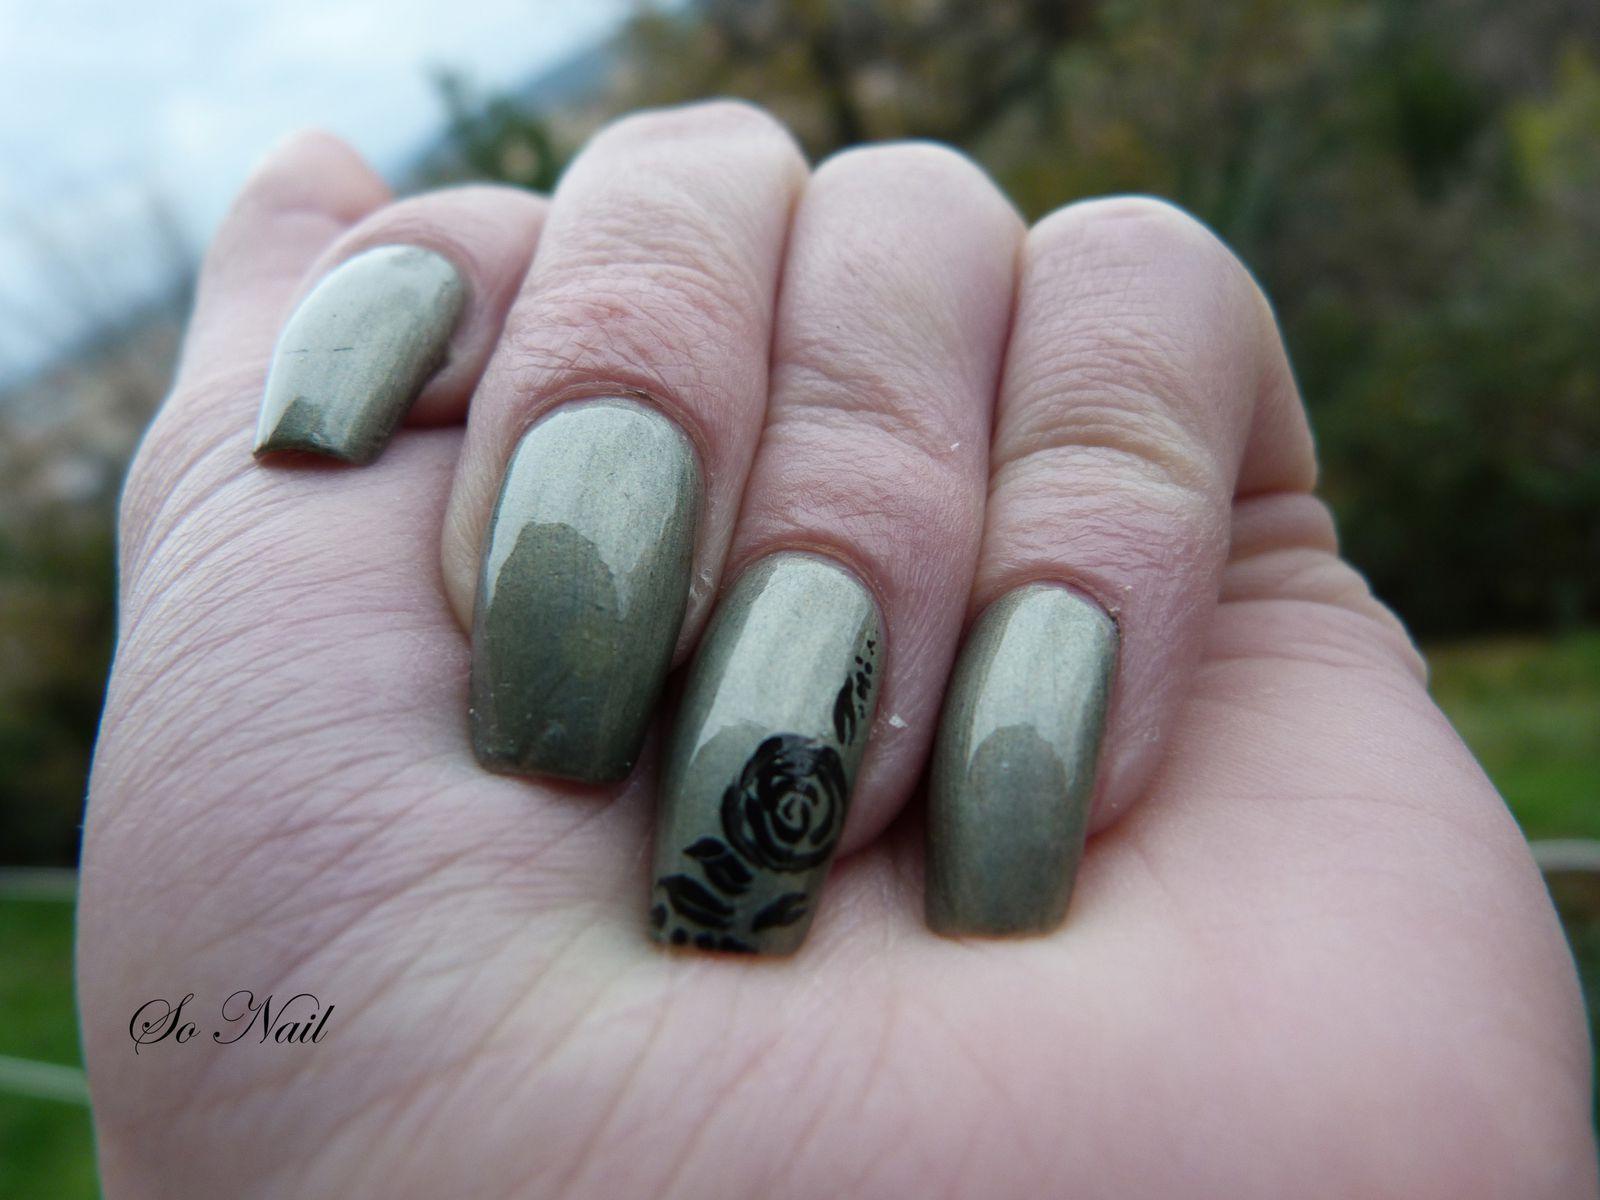 Vernis : Des roses noires